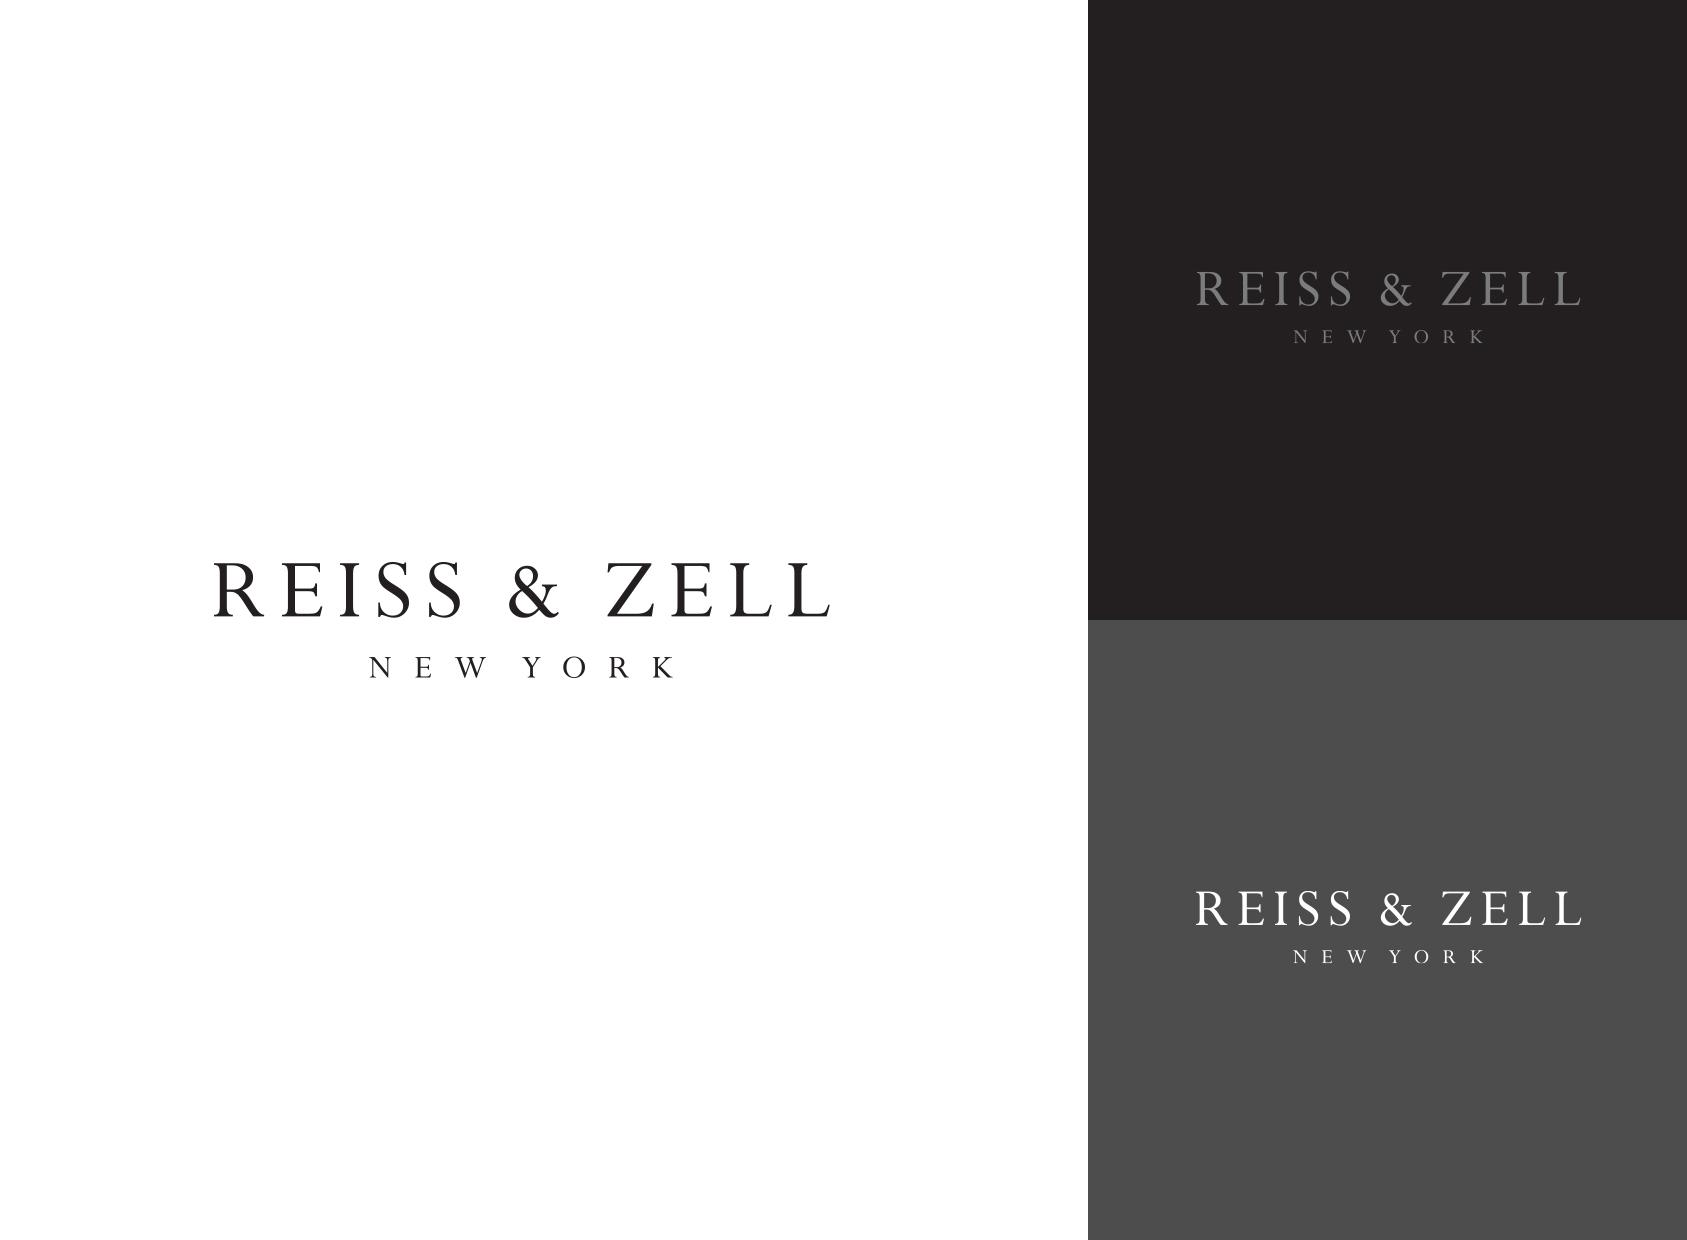 logo design for a jewelry brand